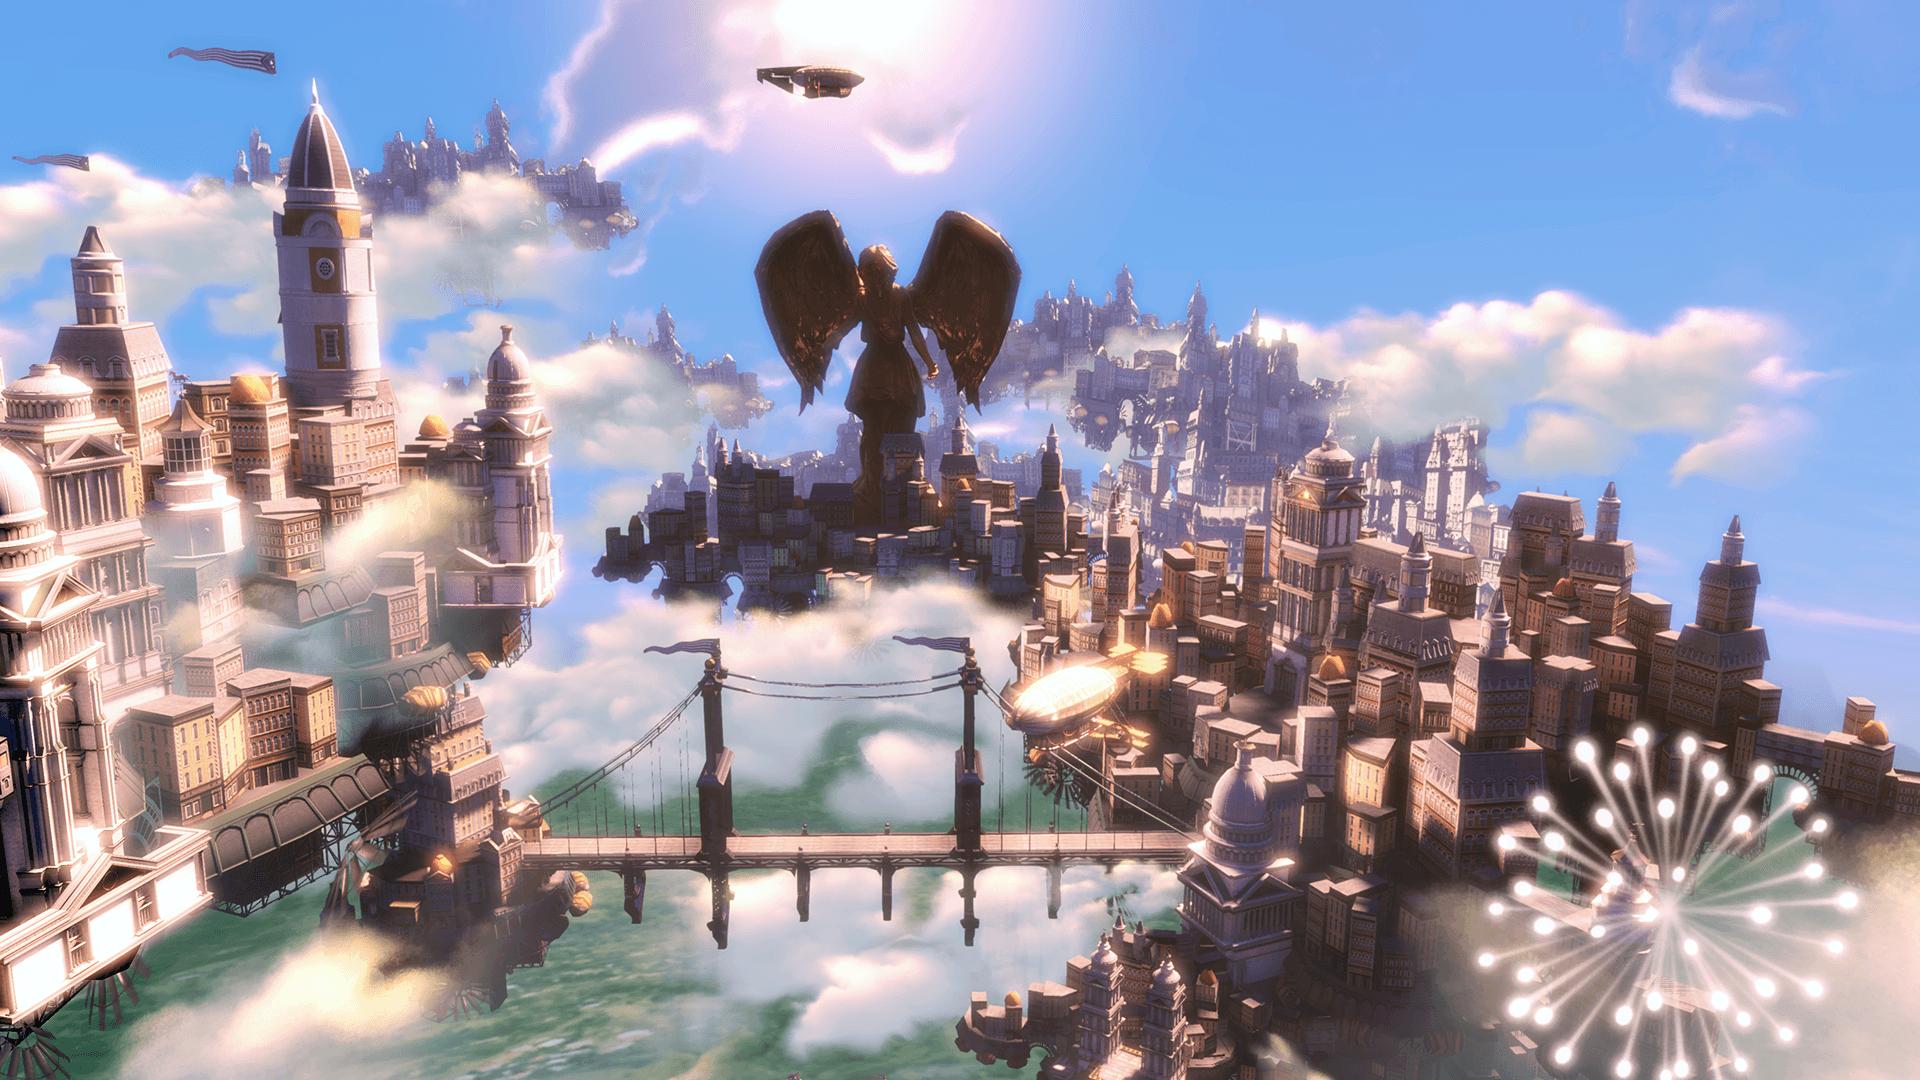 BioShock Infinite City Wallpapers - Top Free BioShock ...